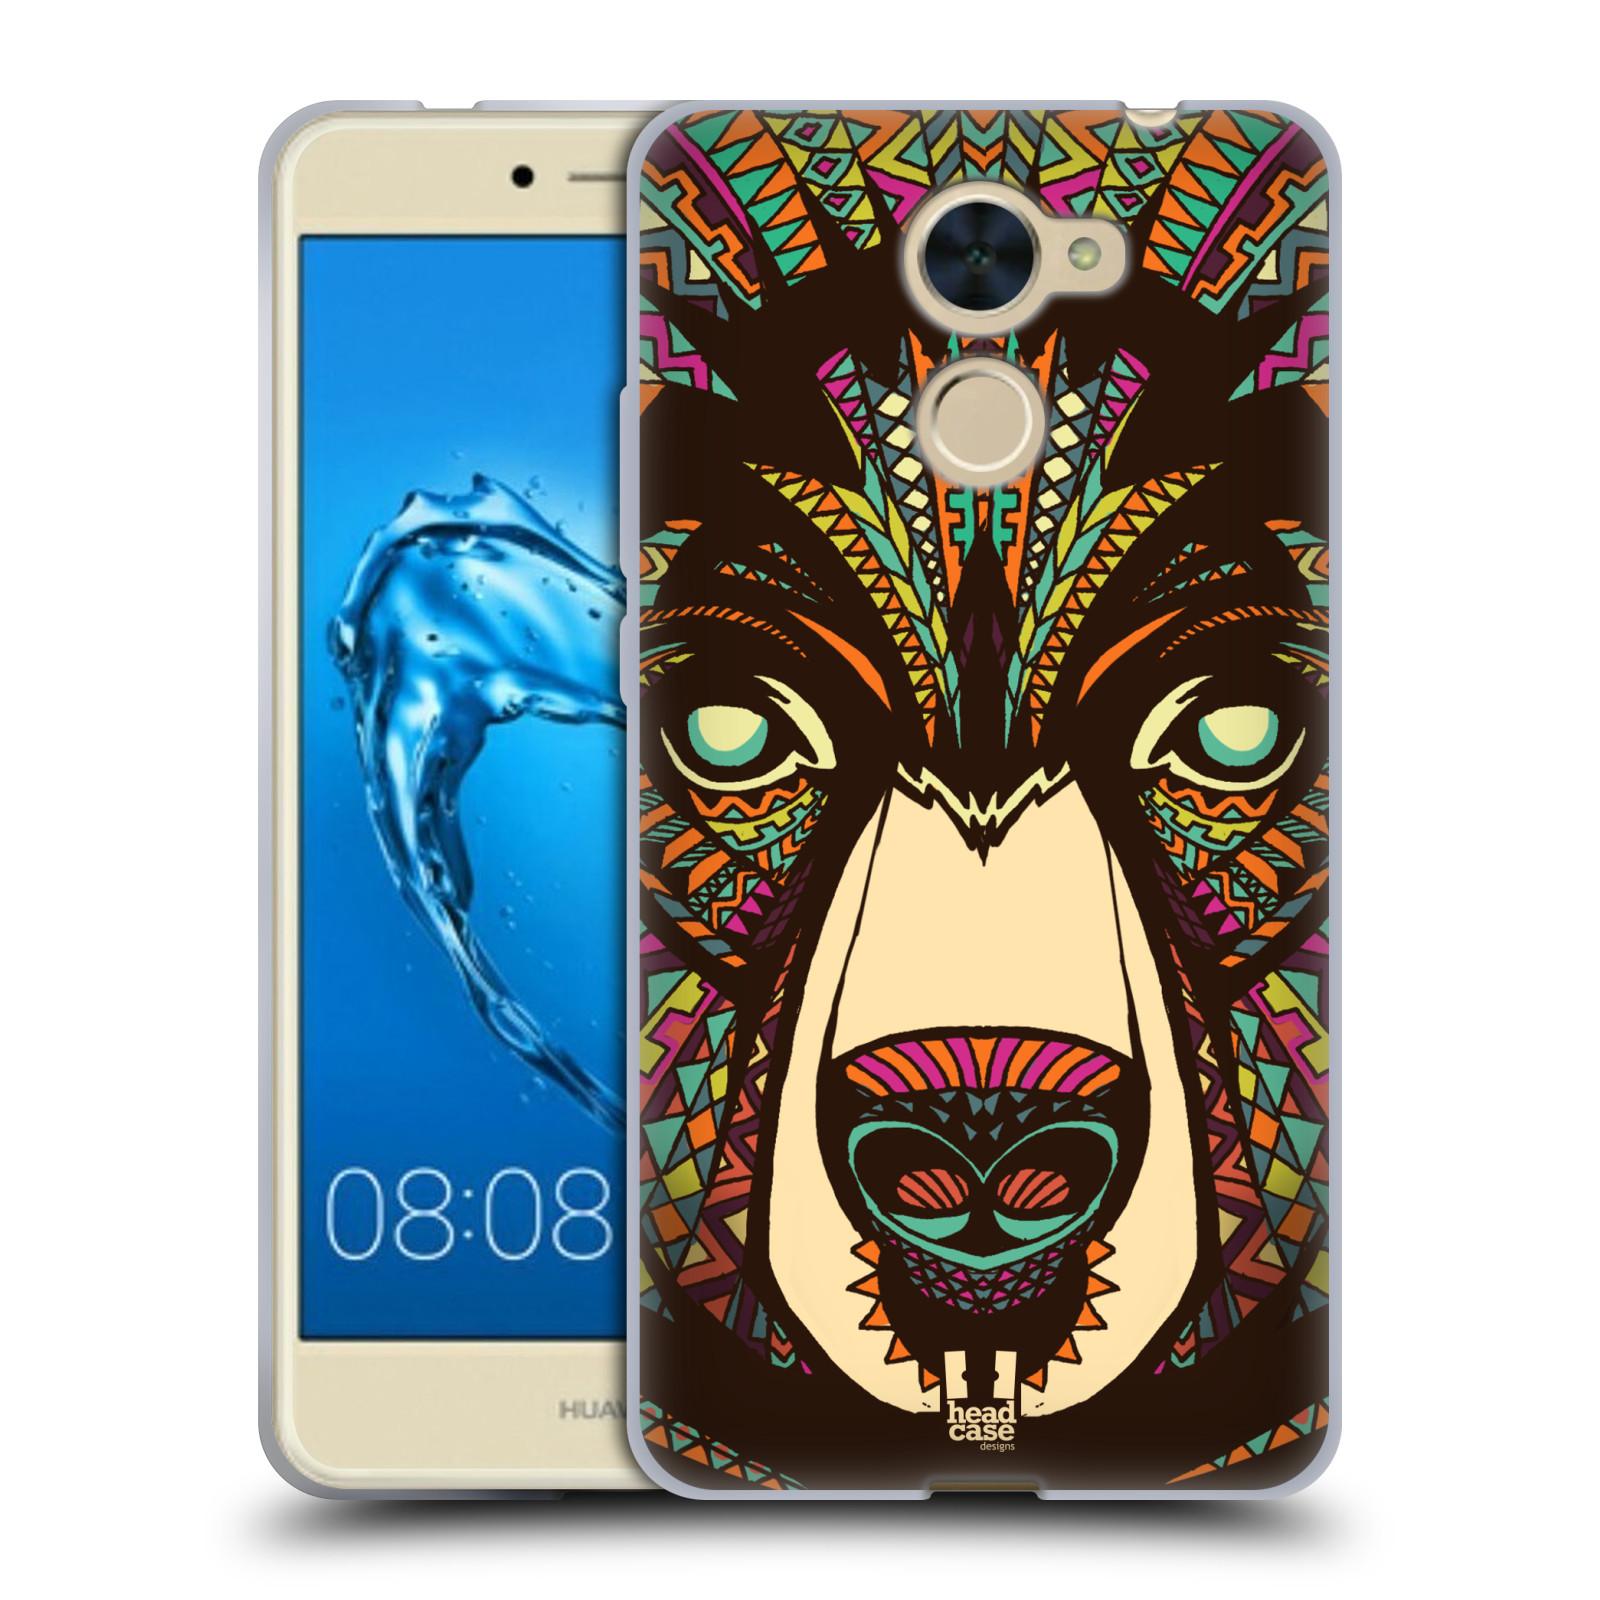 Silikonové pouzdro na mobil Huawei Y7 - Head Case - AZTEC MEDVĚD